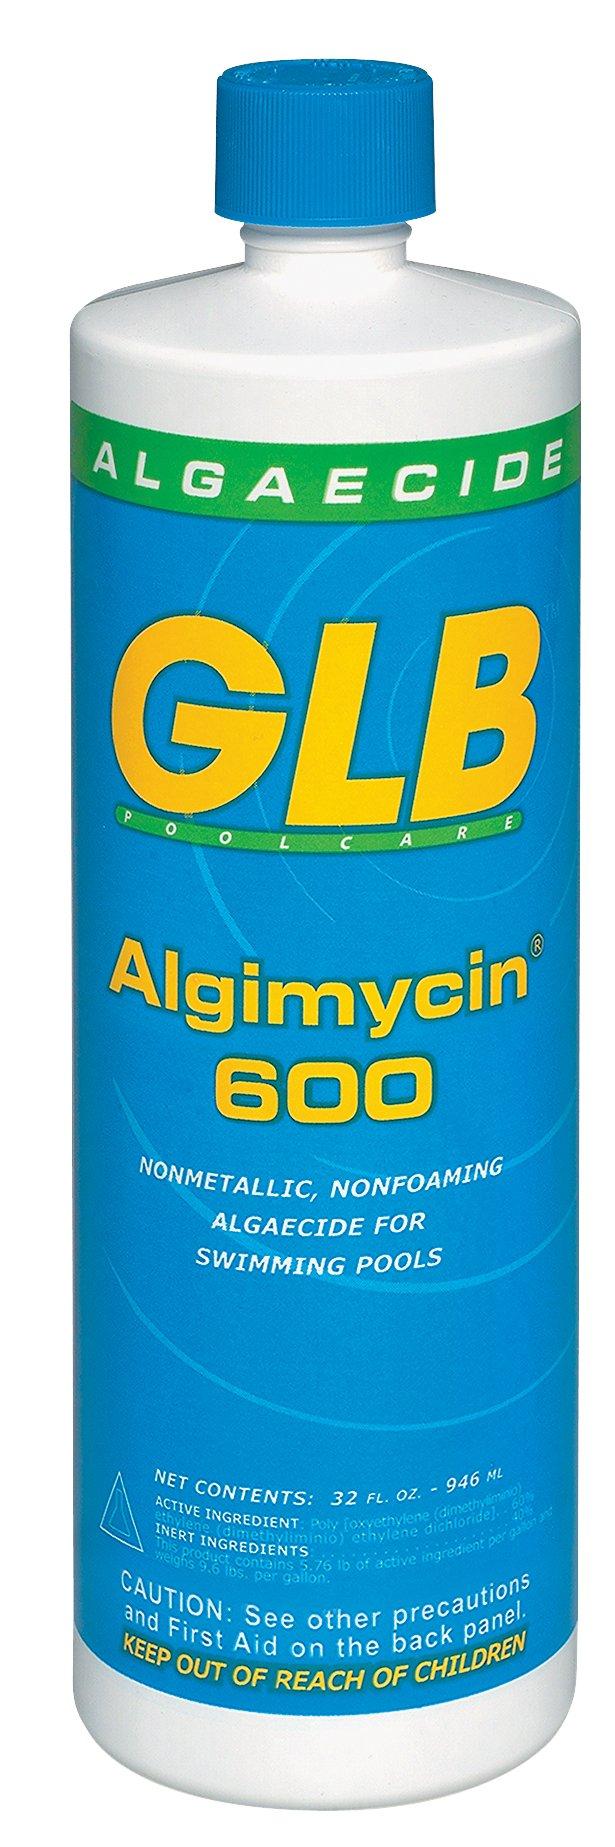 GLB Pool & Spa Products 71108 Algimycin 600 1-Quart Algaecide